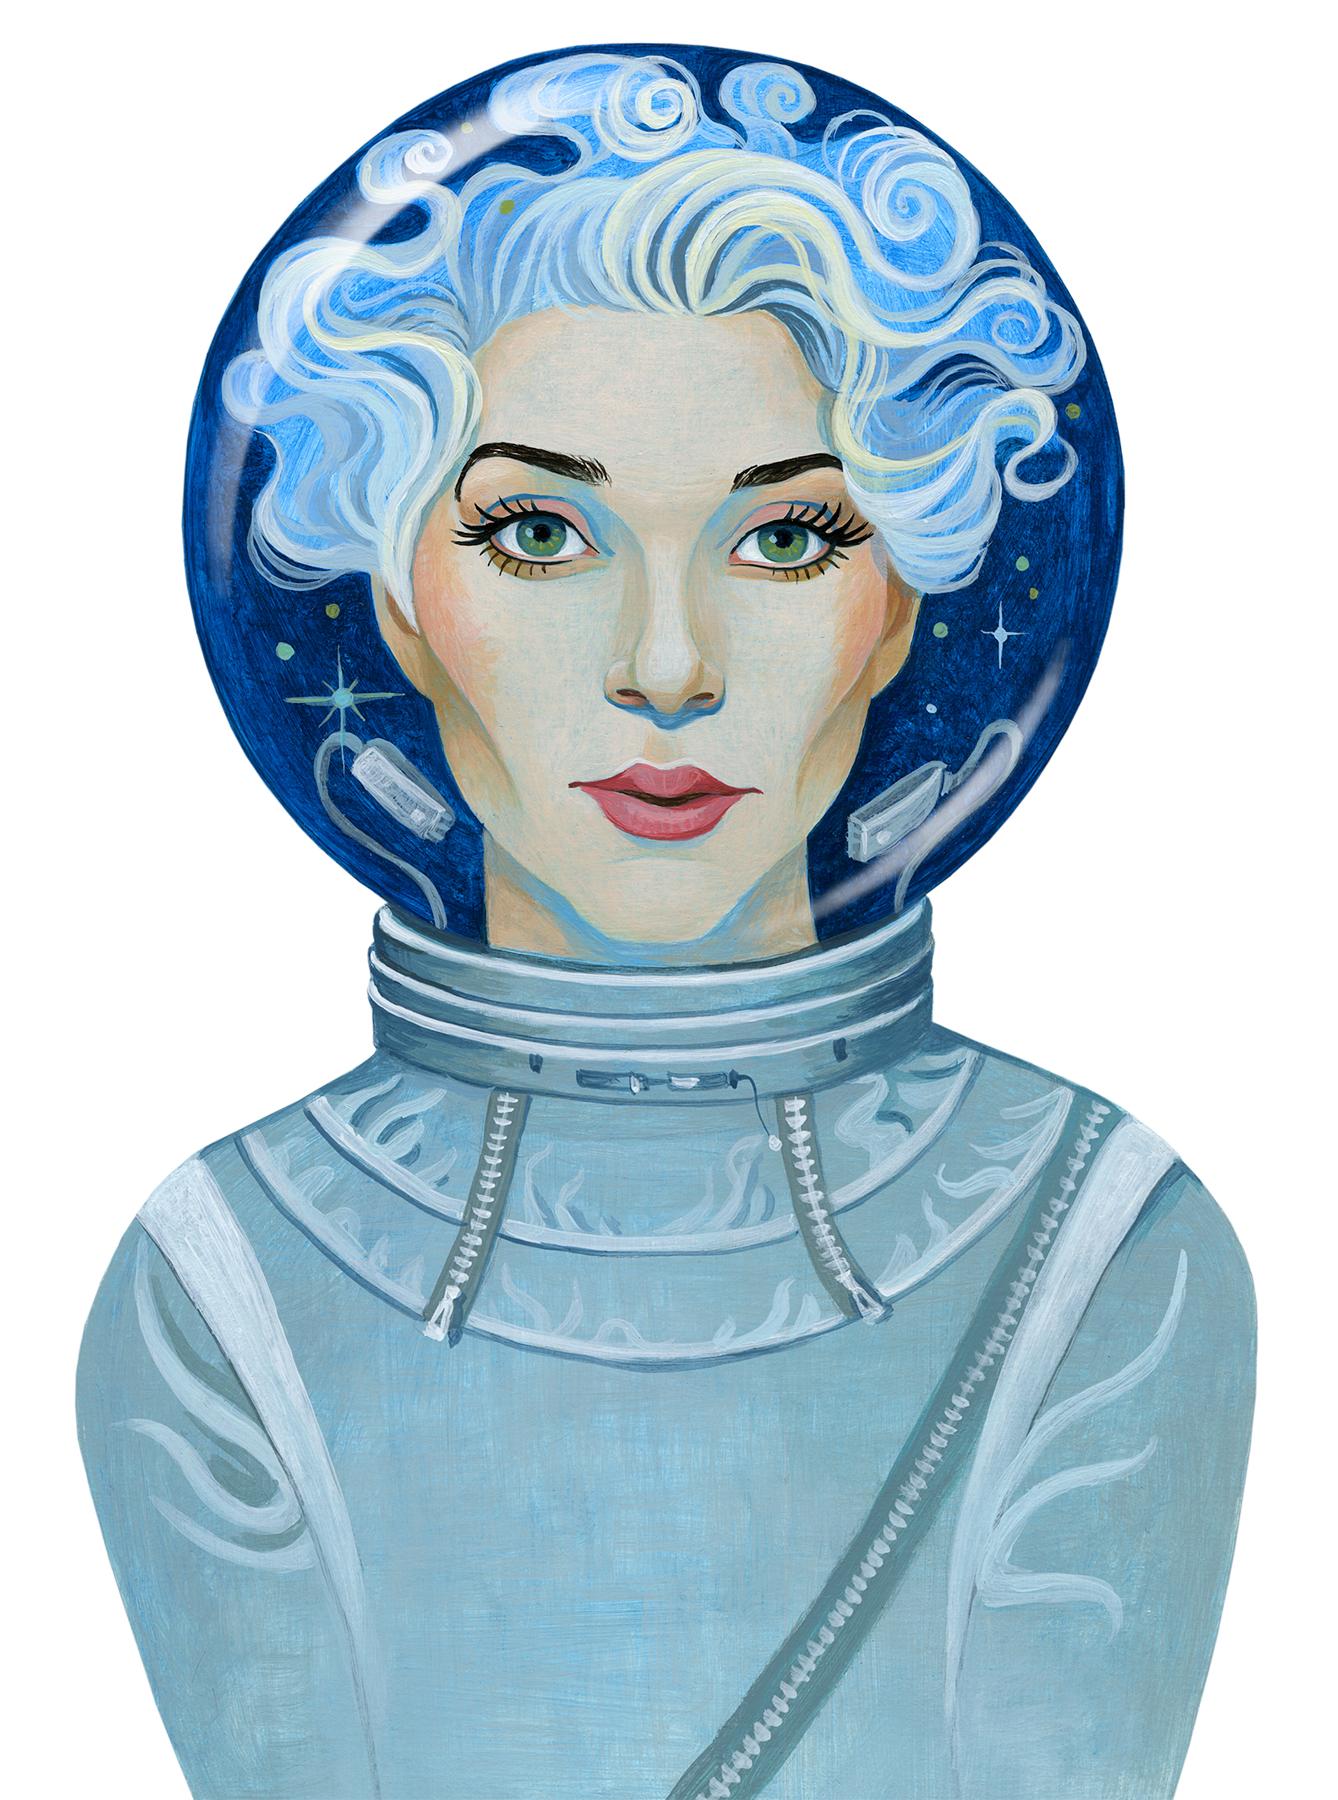 St. Vincent's Space Oddities Playlist